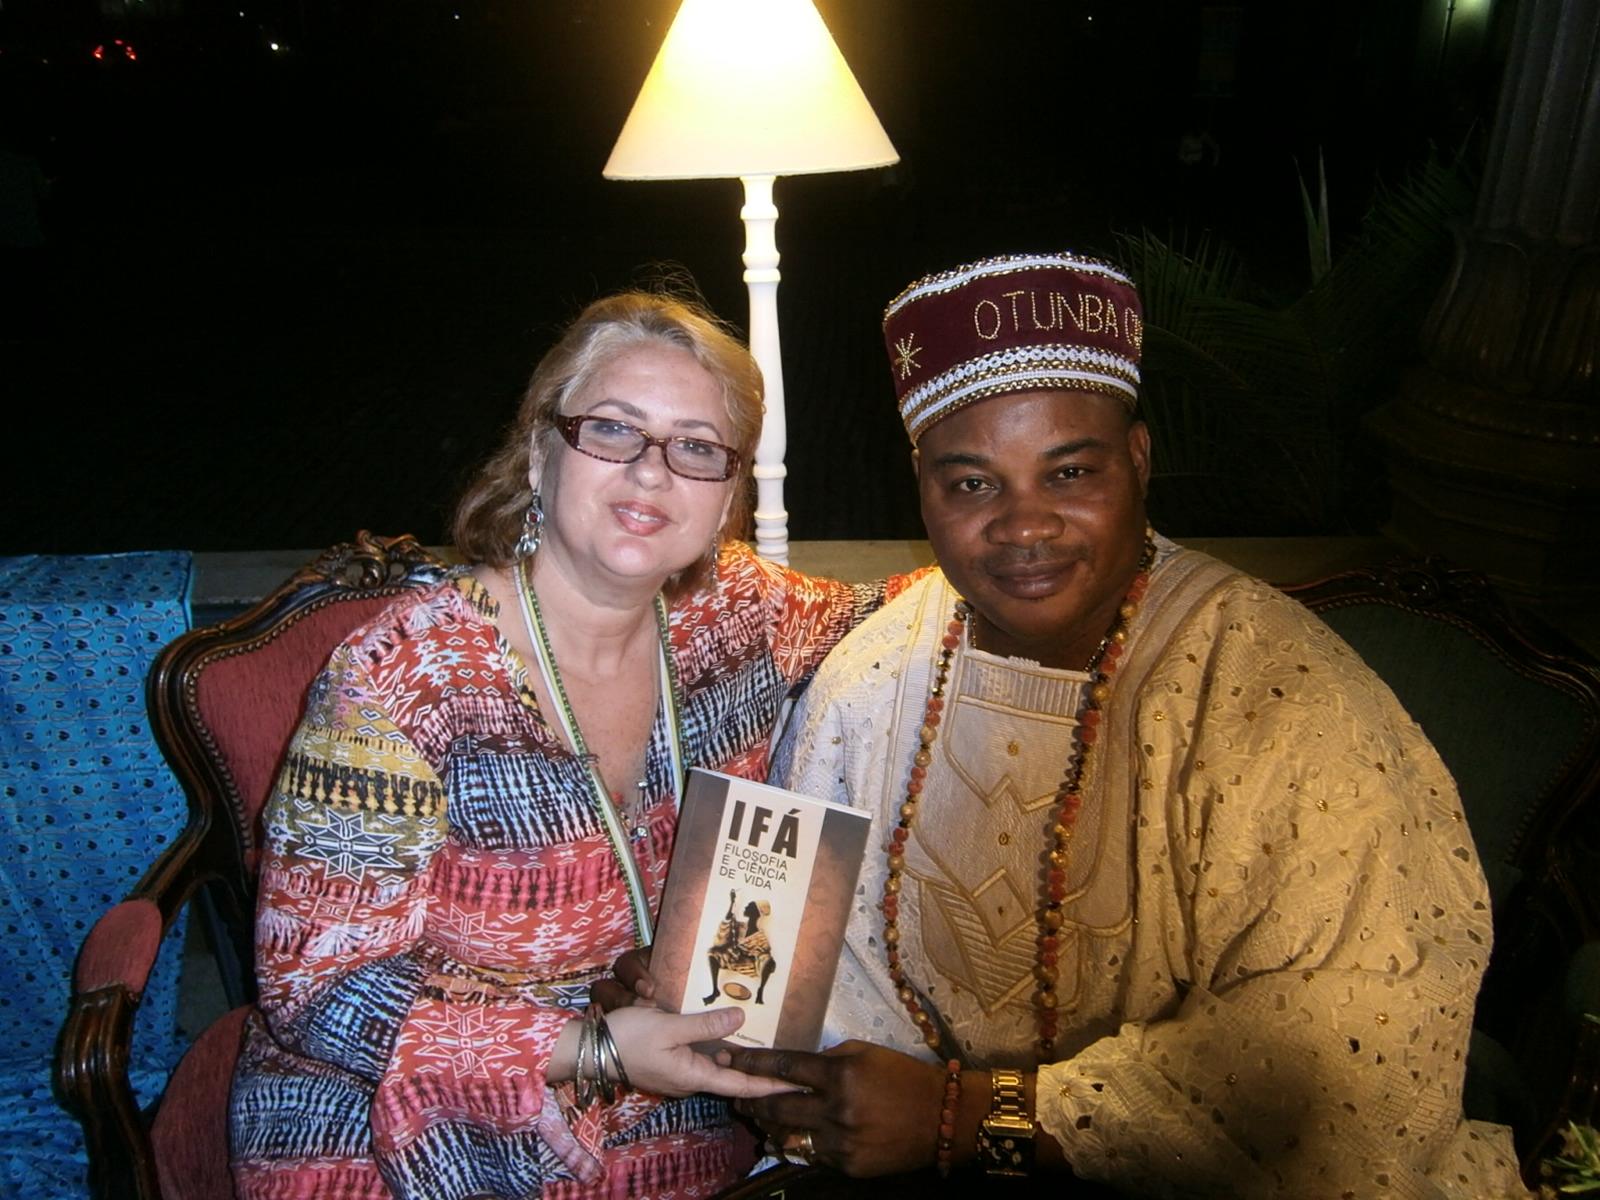 Lançamento do Livro de Otunba Adekunle Aderonmu na Mini Book Store